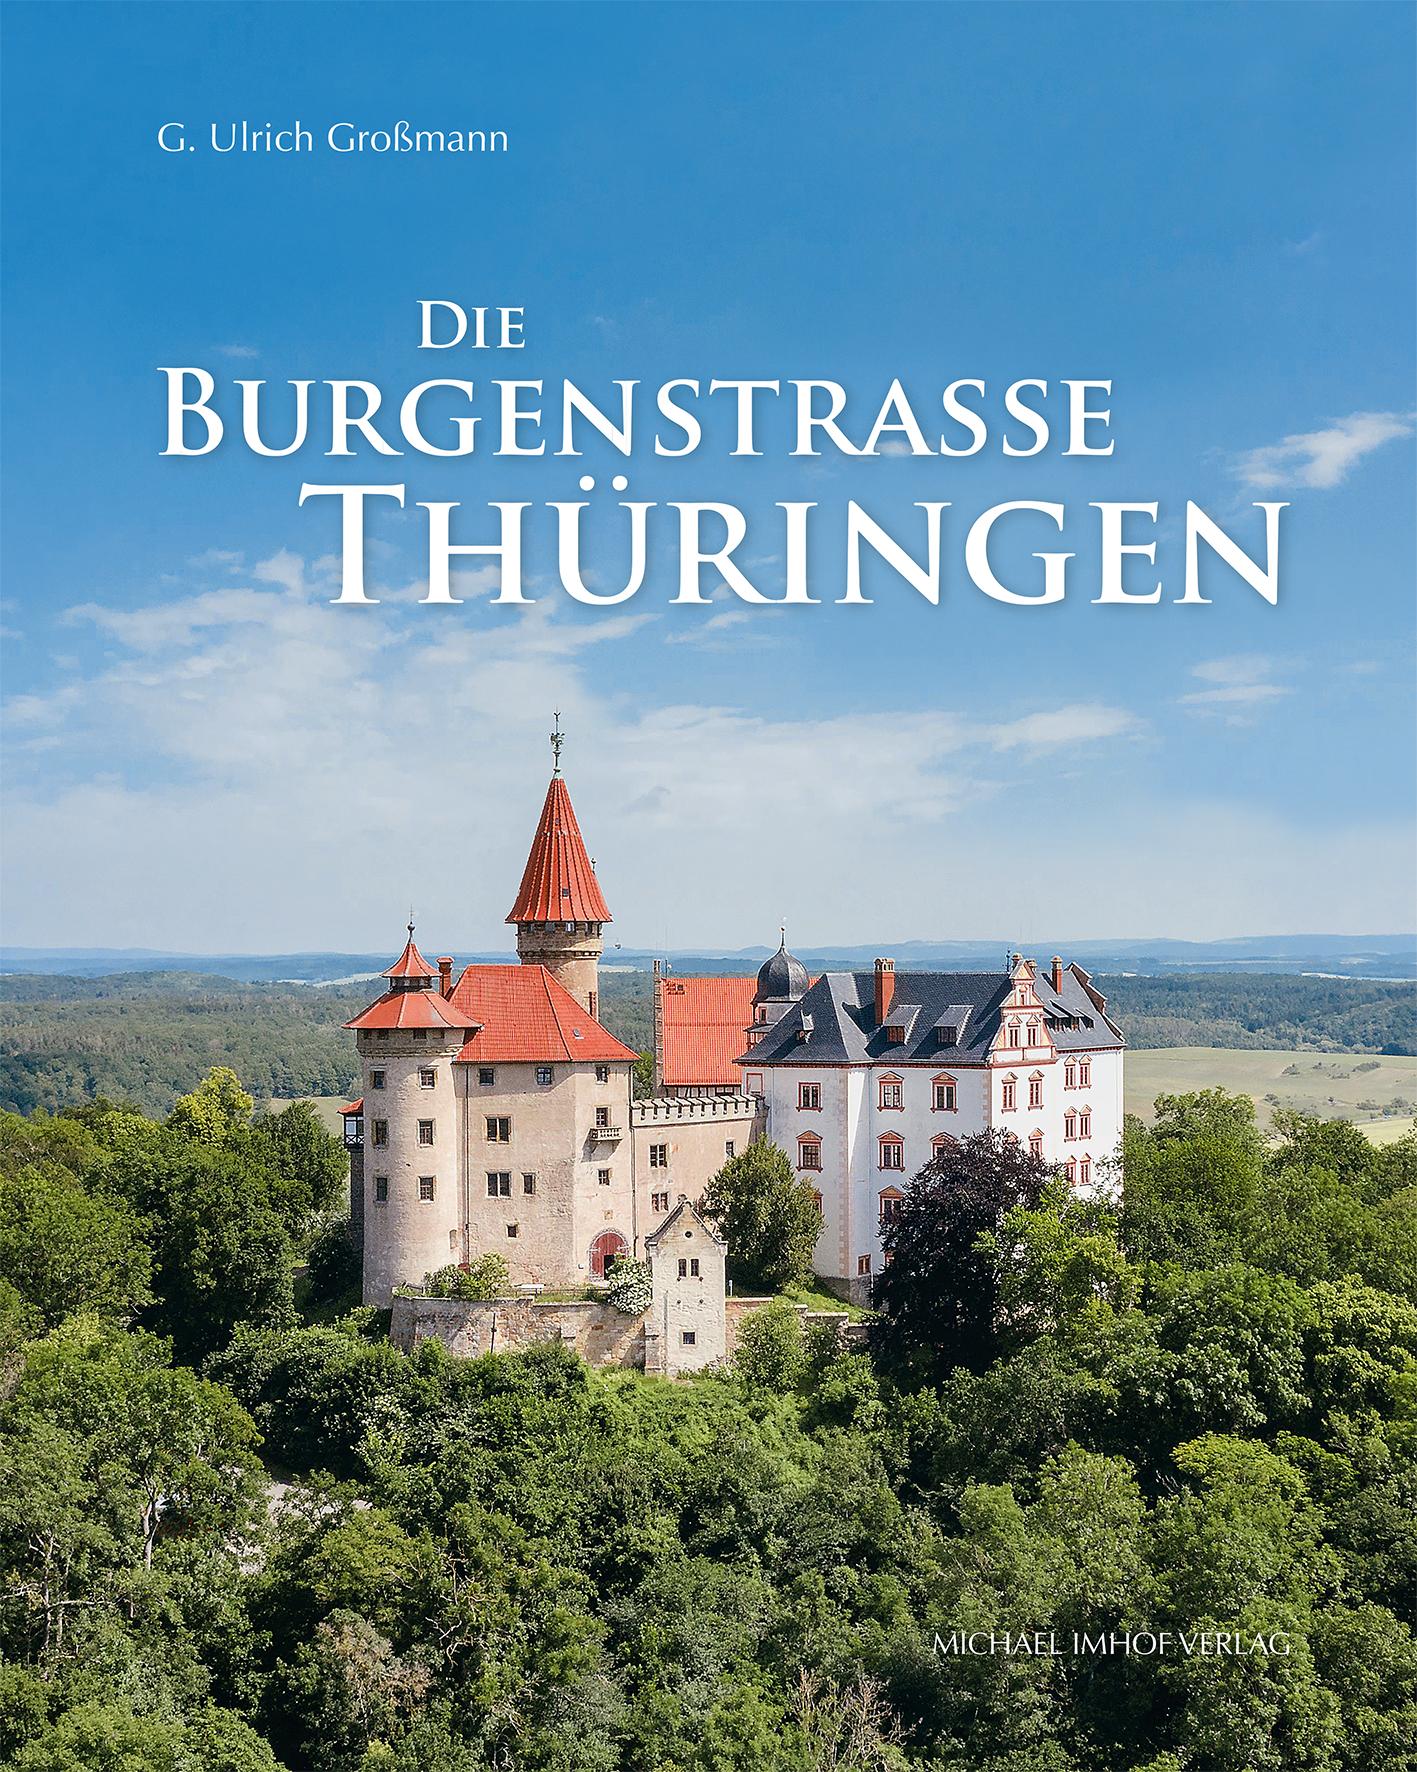 NEU_Burgenstrafle-Thueringen-Umschlag.qxp_Layout 1